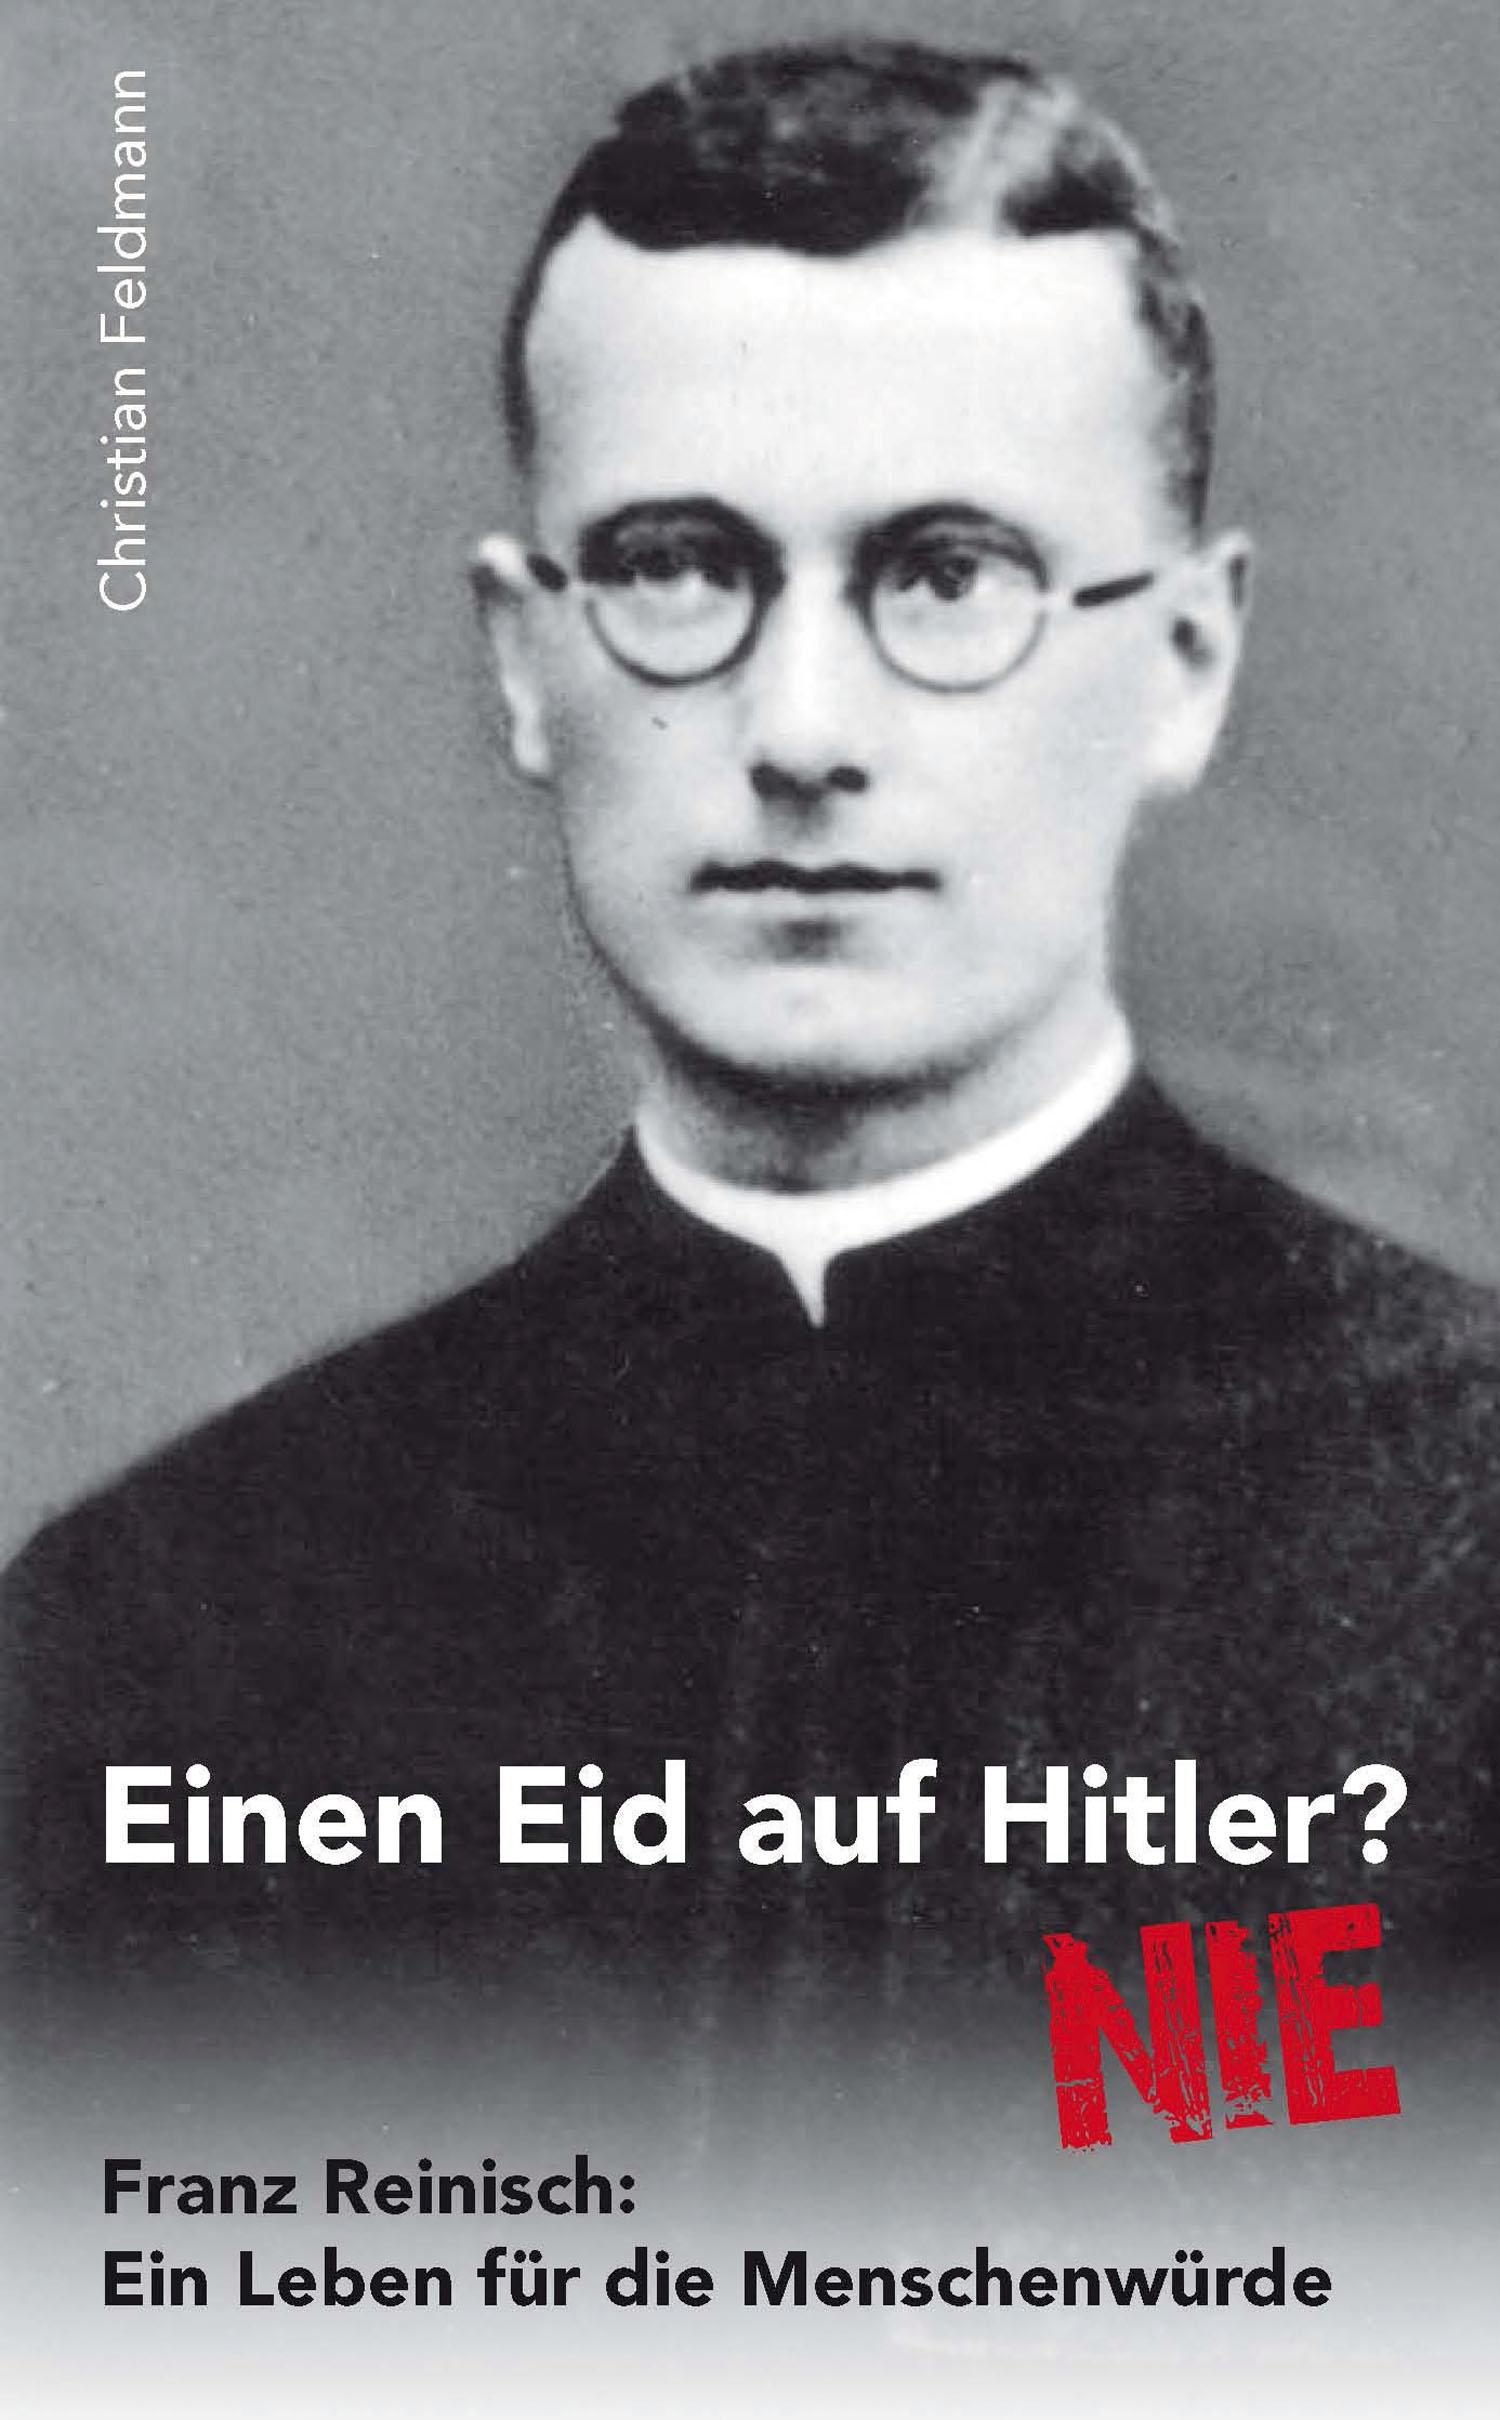 Christian Feldmann Einen Eid auf Hitler? NIE hitler